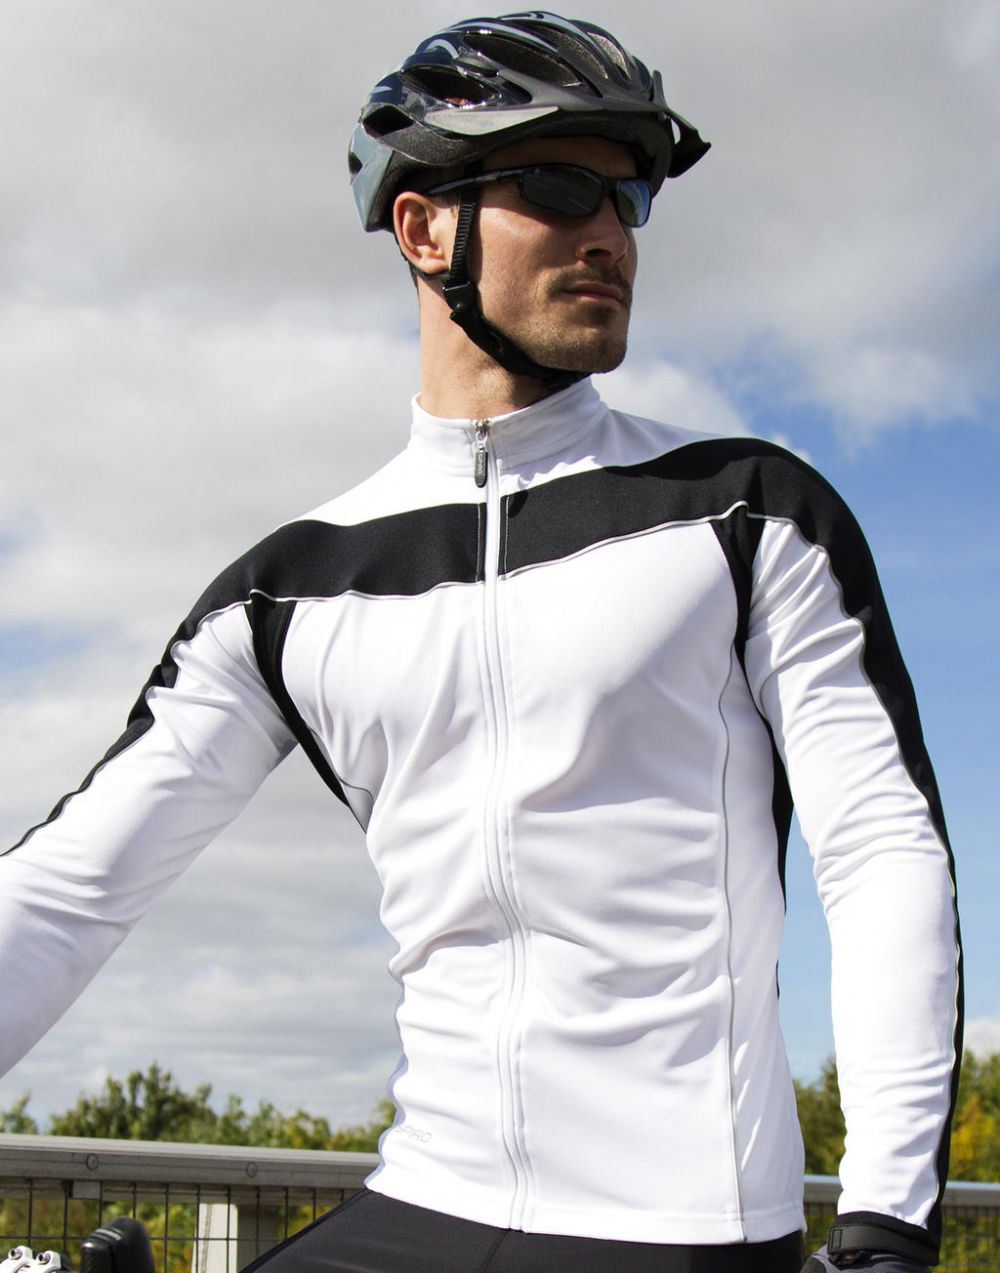 Equipaciones deportivas result top ciclismo manga larga hombre vista 3